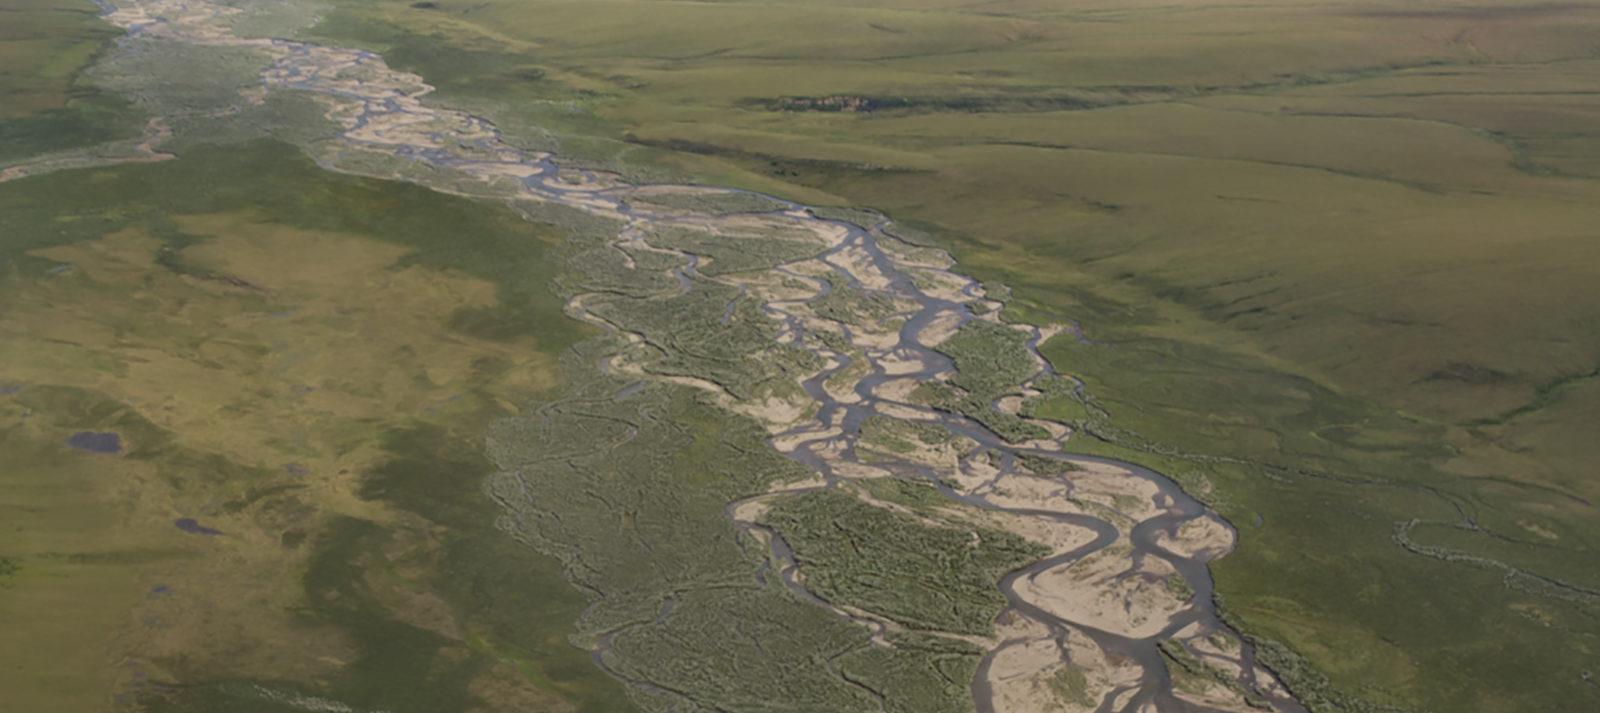 Colville River, Alaska | PHoto: Jason Leppi, The Wilderness Society